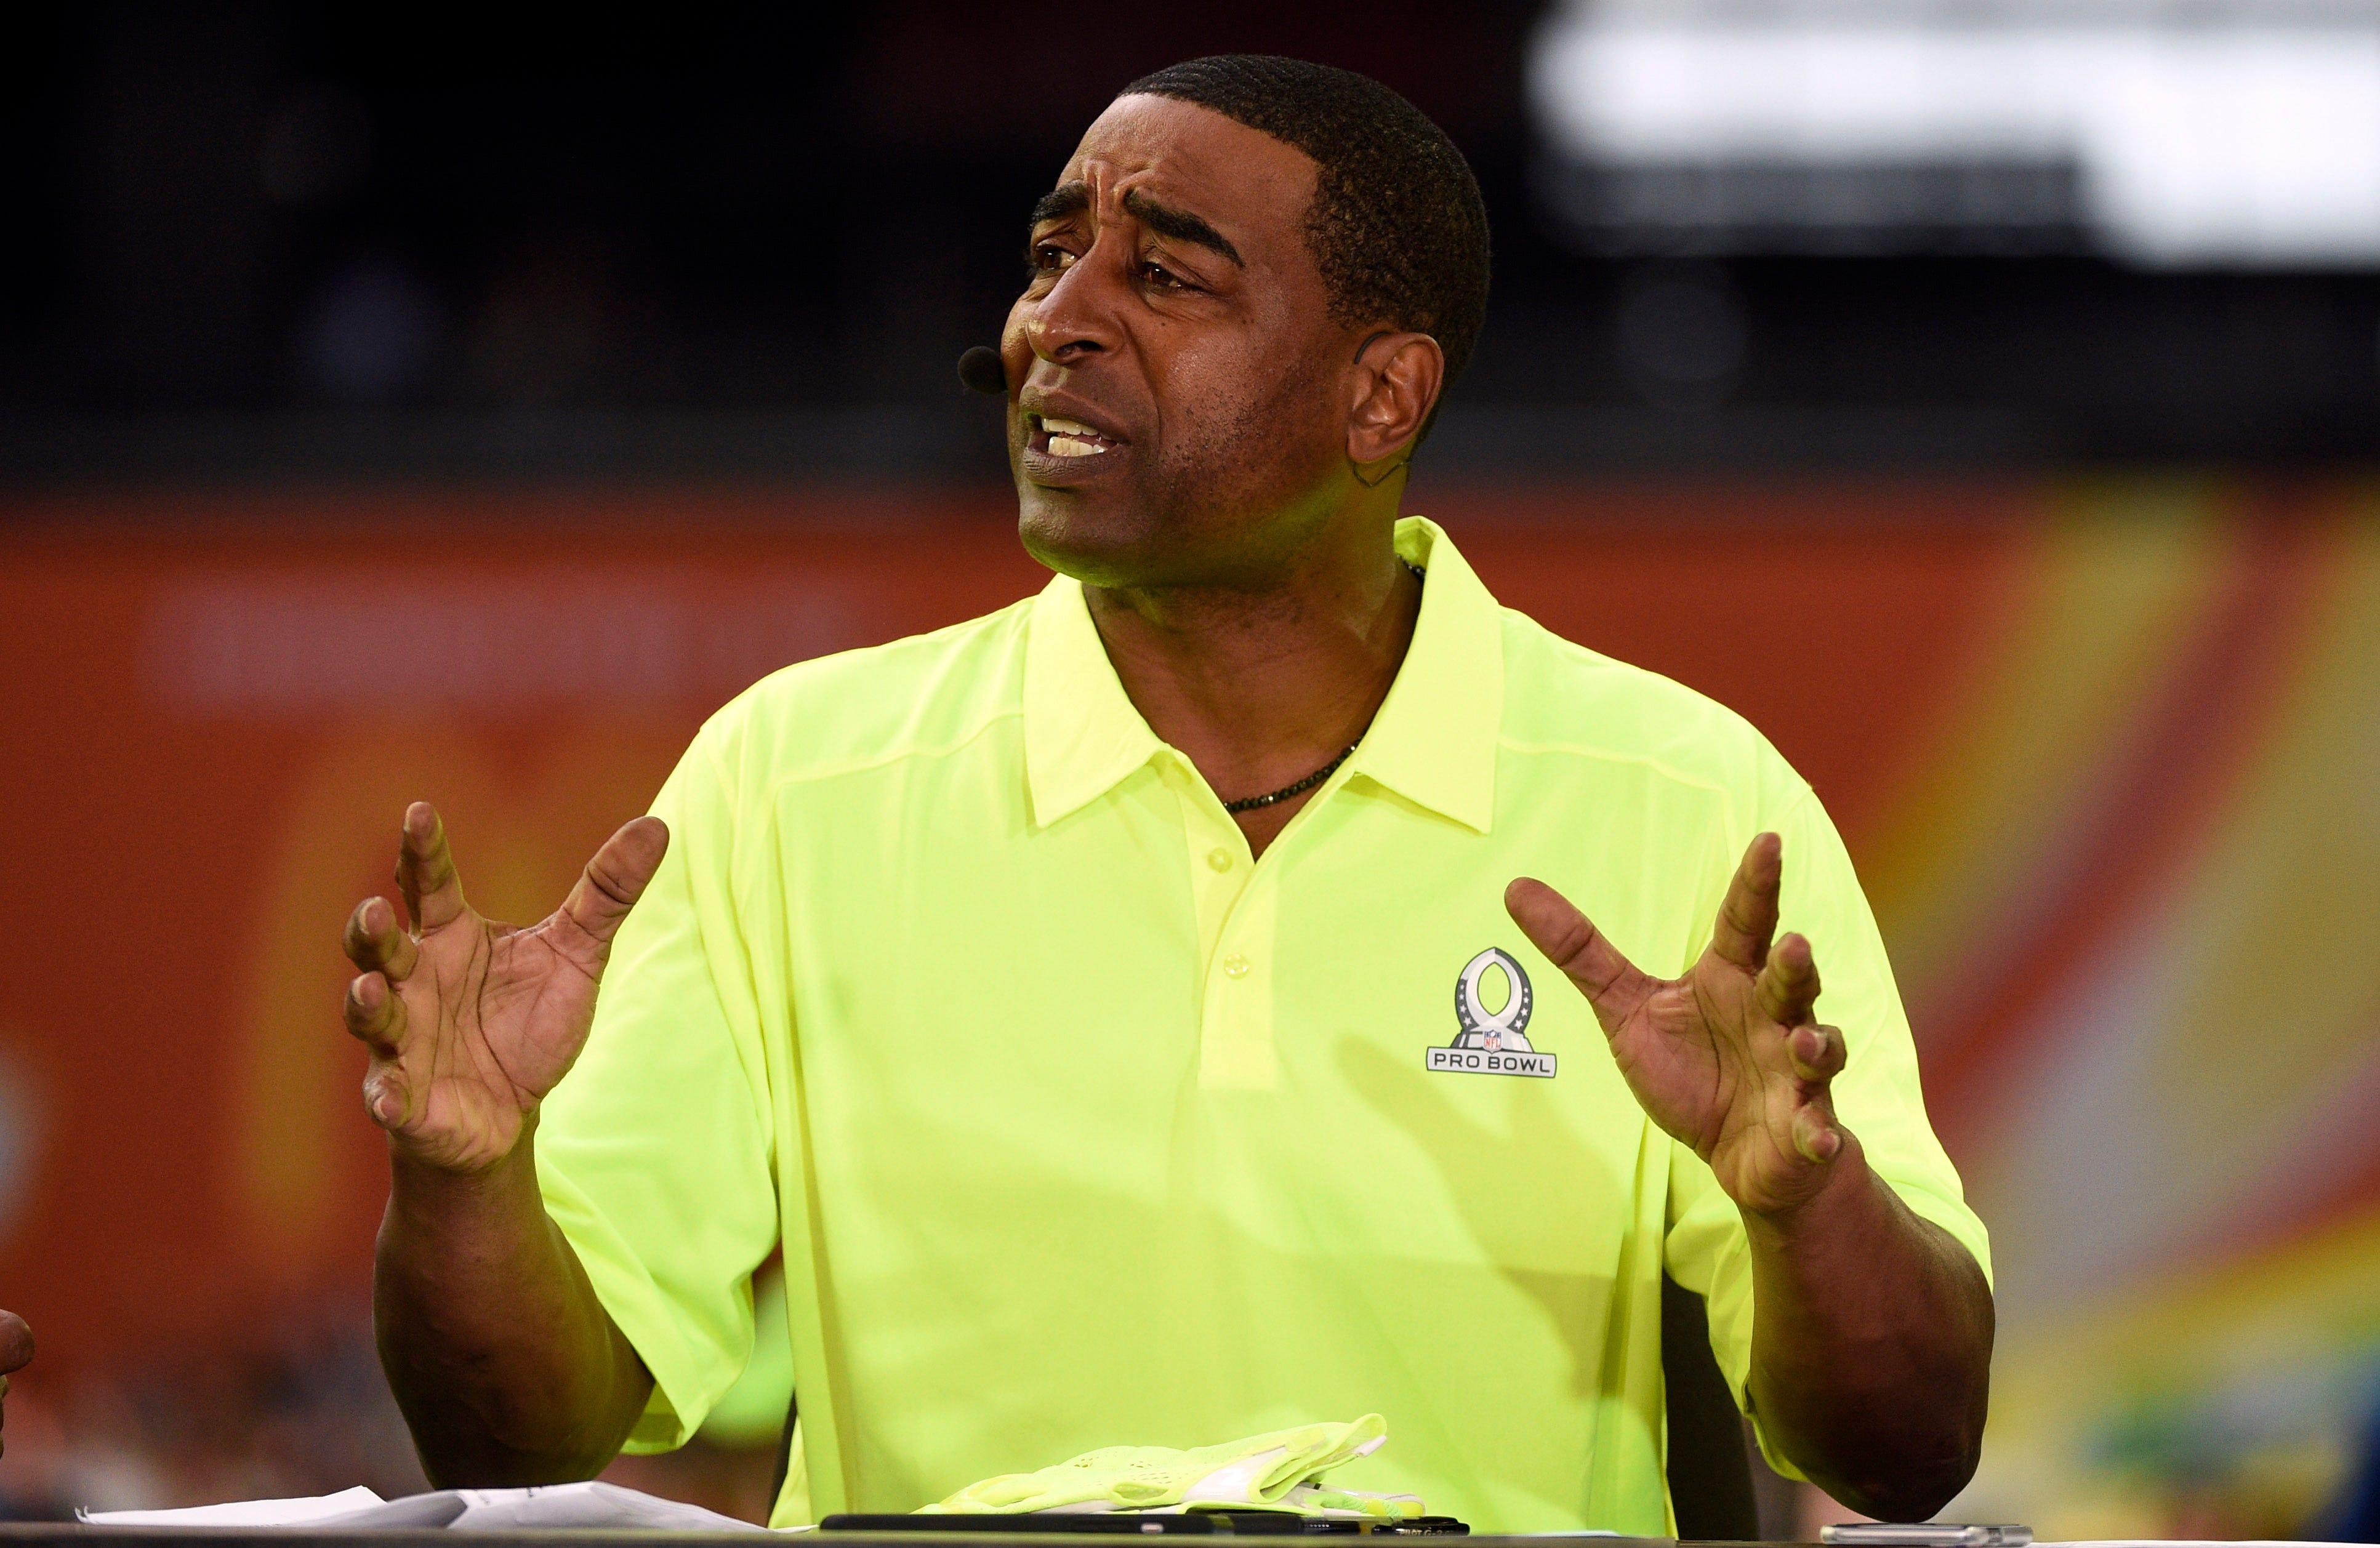 Hall of Fame receiver Cris Carter, Fox Sports part ways